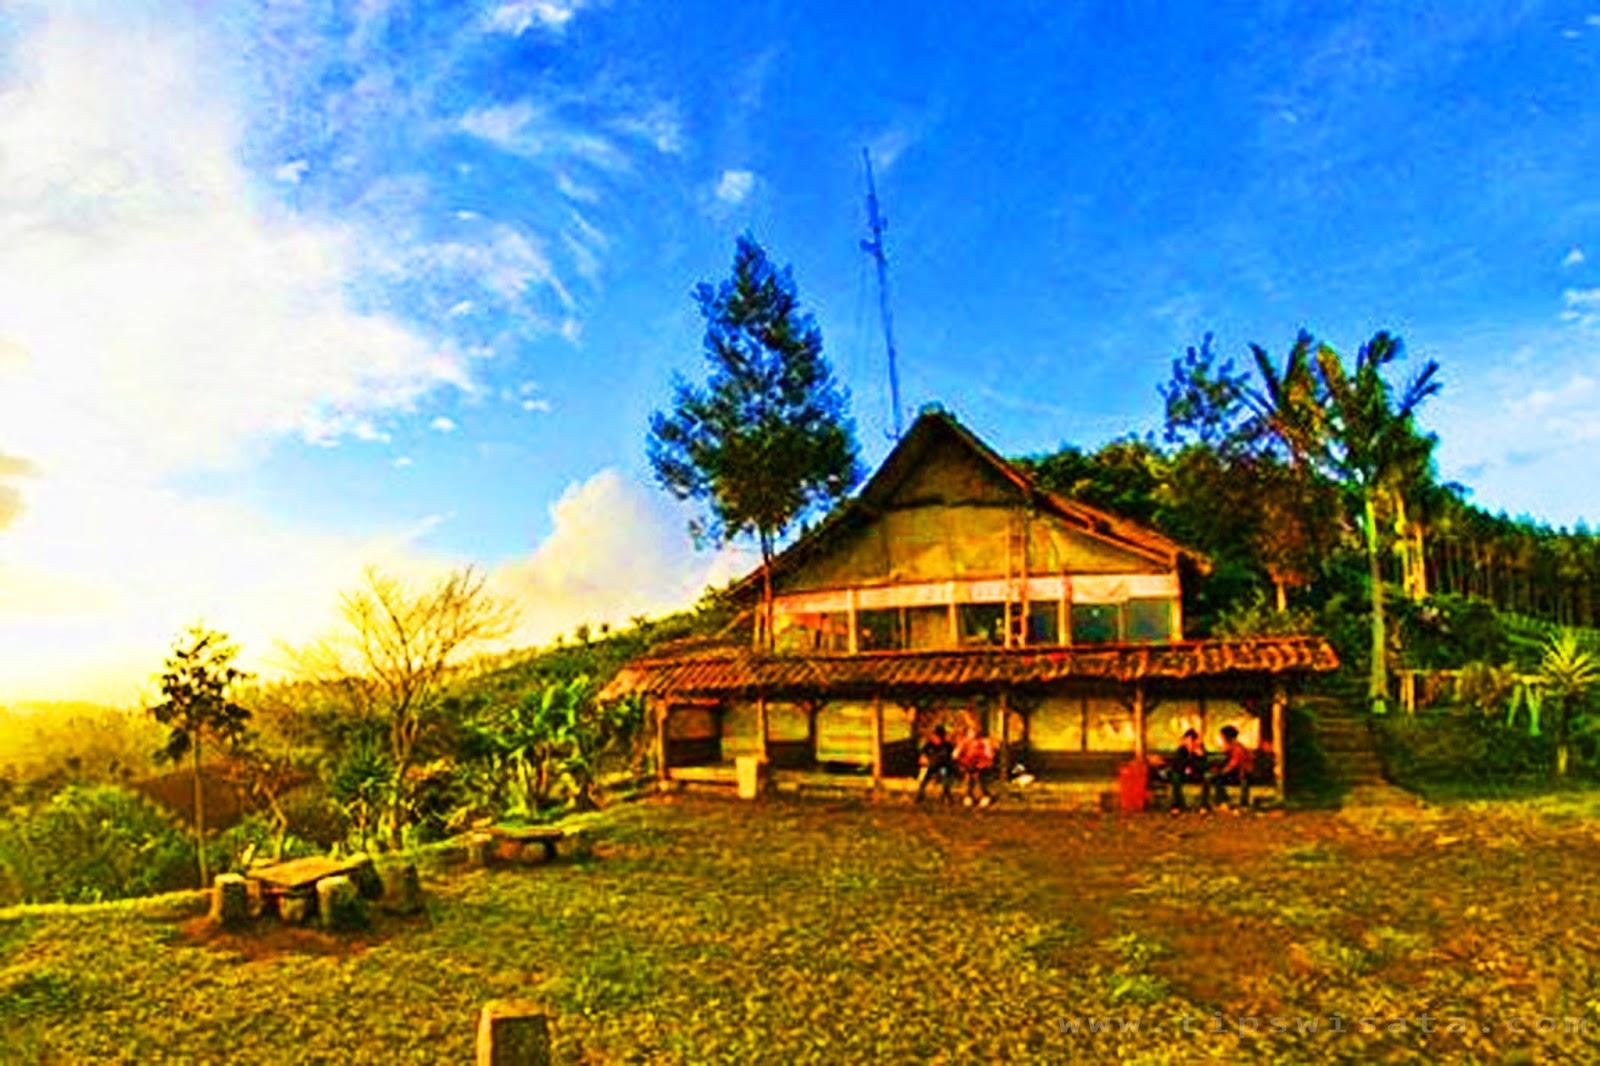 Panorama Wisata Bukit Moko Warung Daweung Cimenyan Bandung Bintang Kab